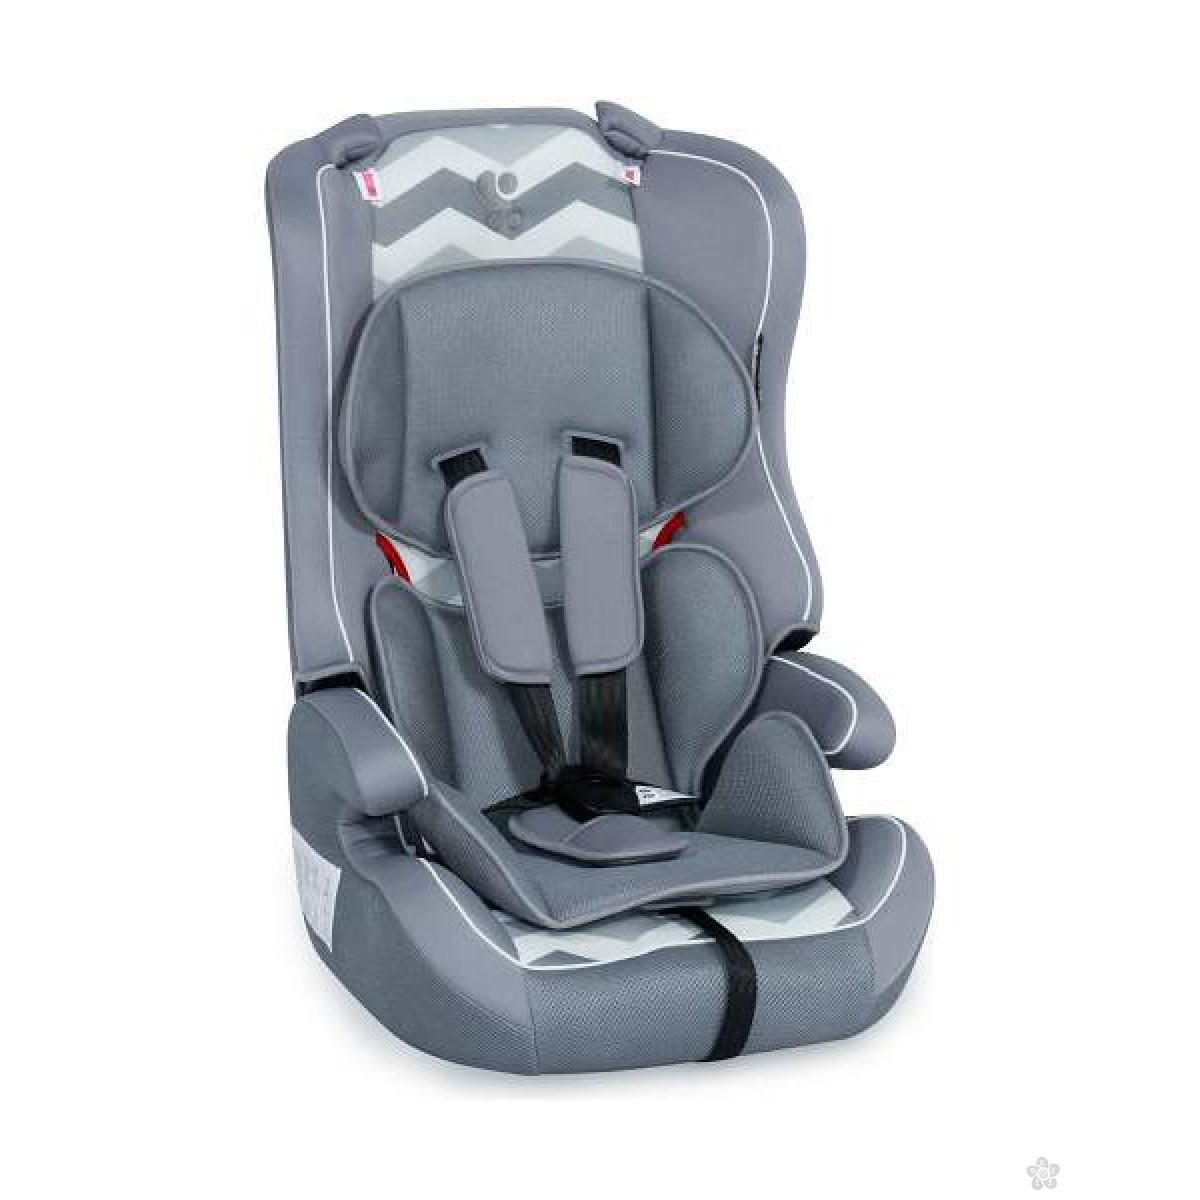 Auto Sedište Explorer Grey 9-36kg, 10070891772